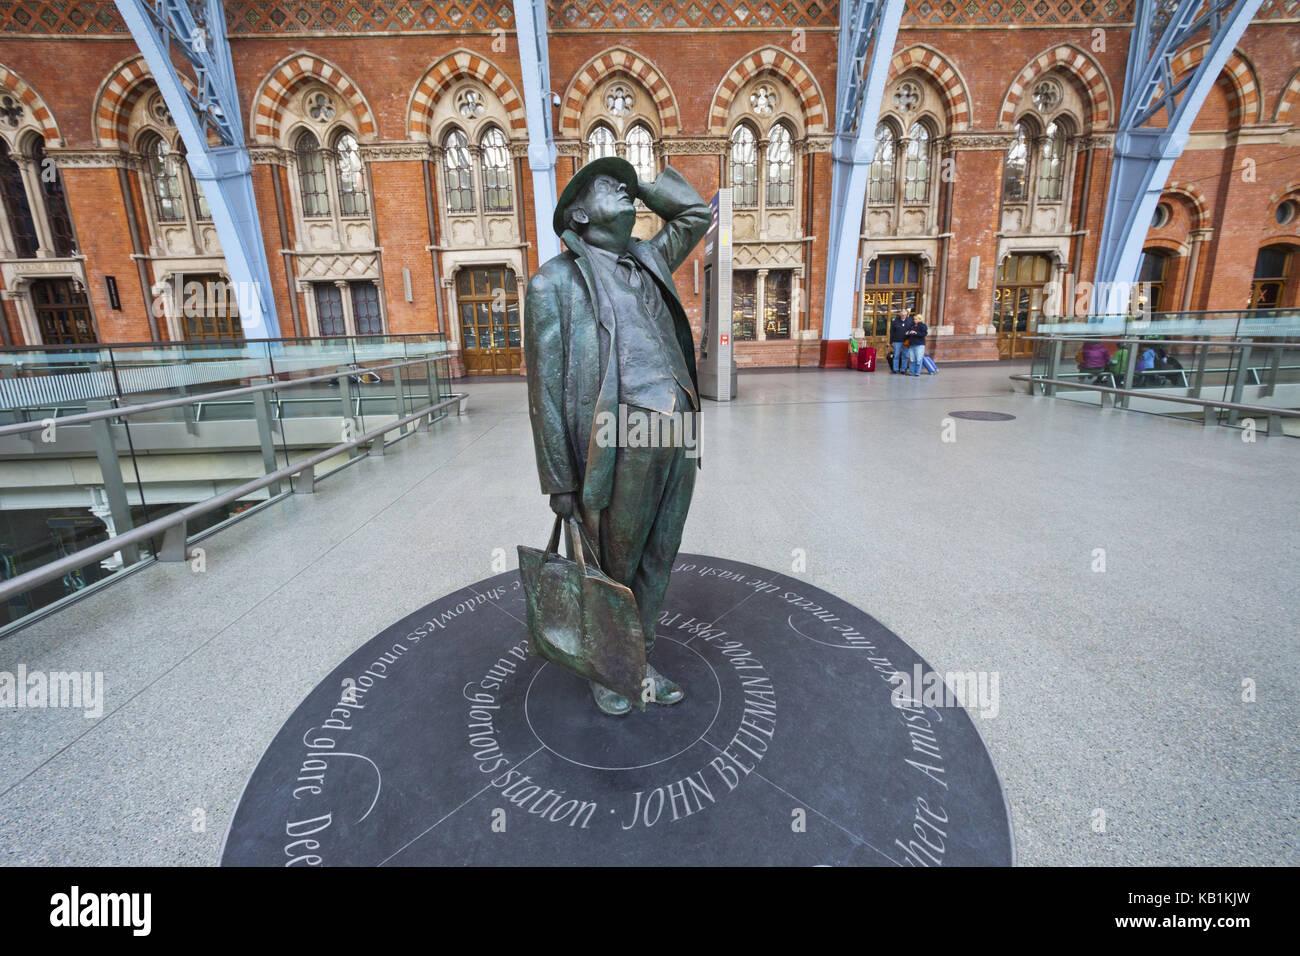 England, London, King's cross, St. Pancras of station, statue of sir John Betjeman von Martin Jennings, - Stock Image